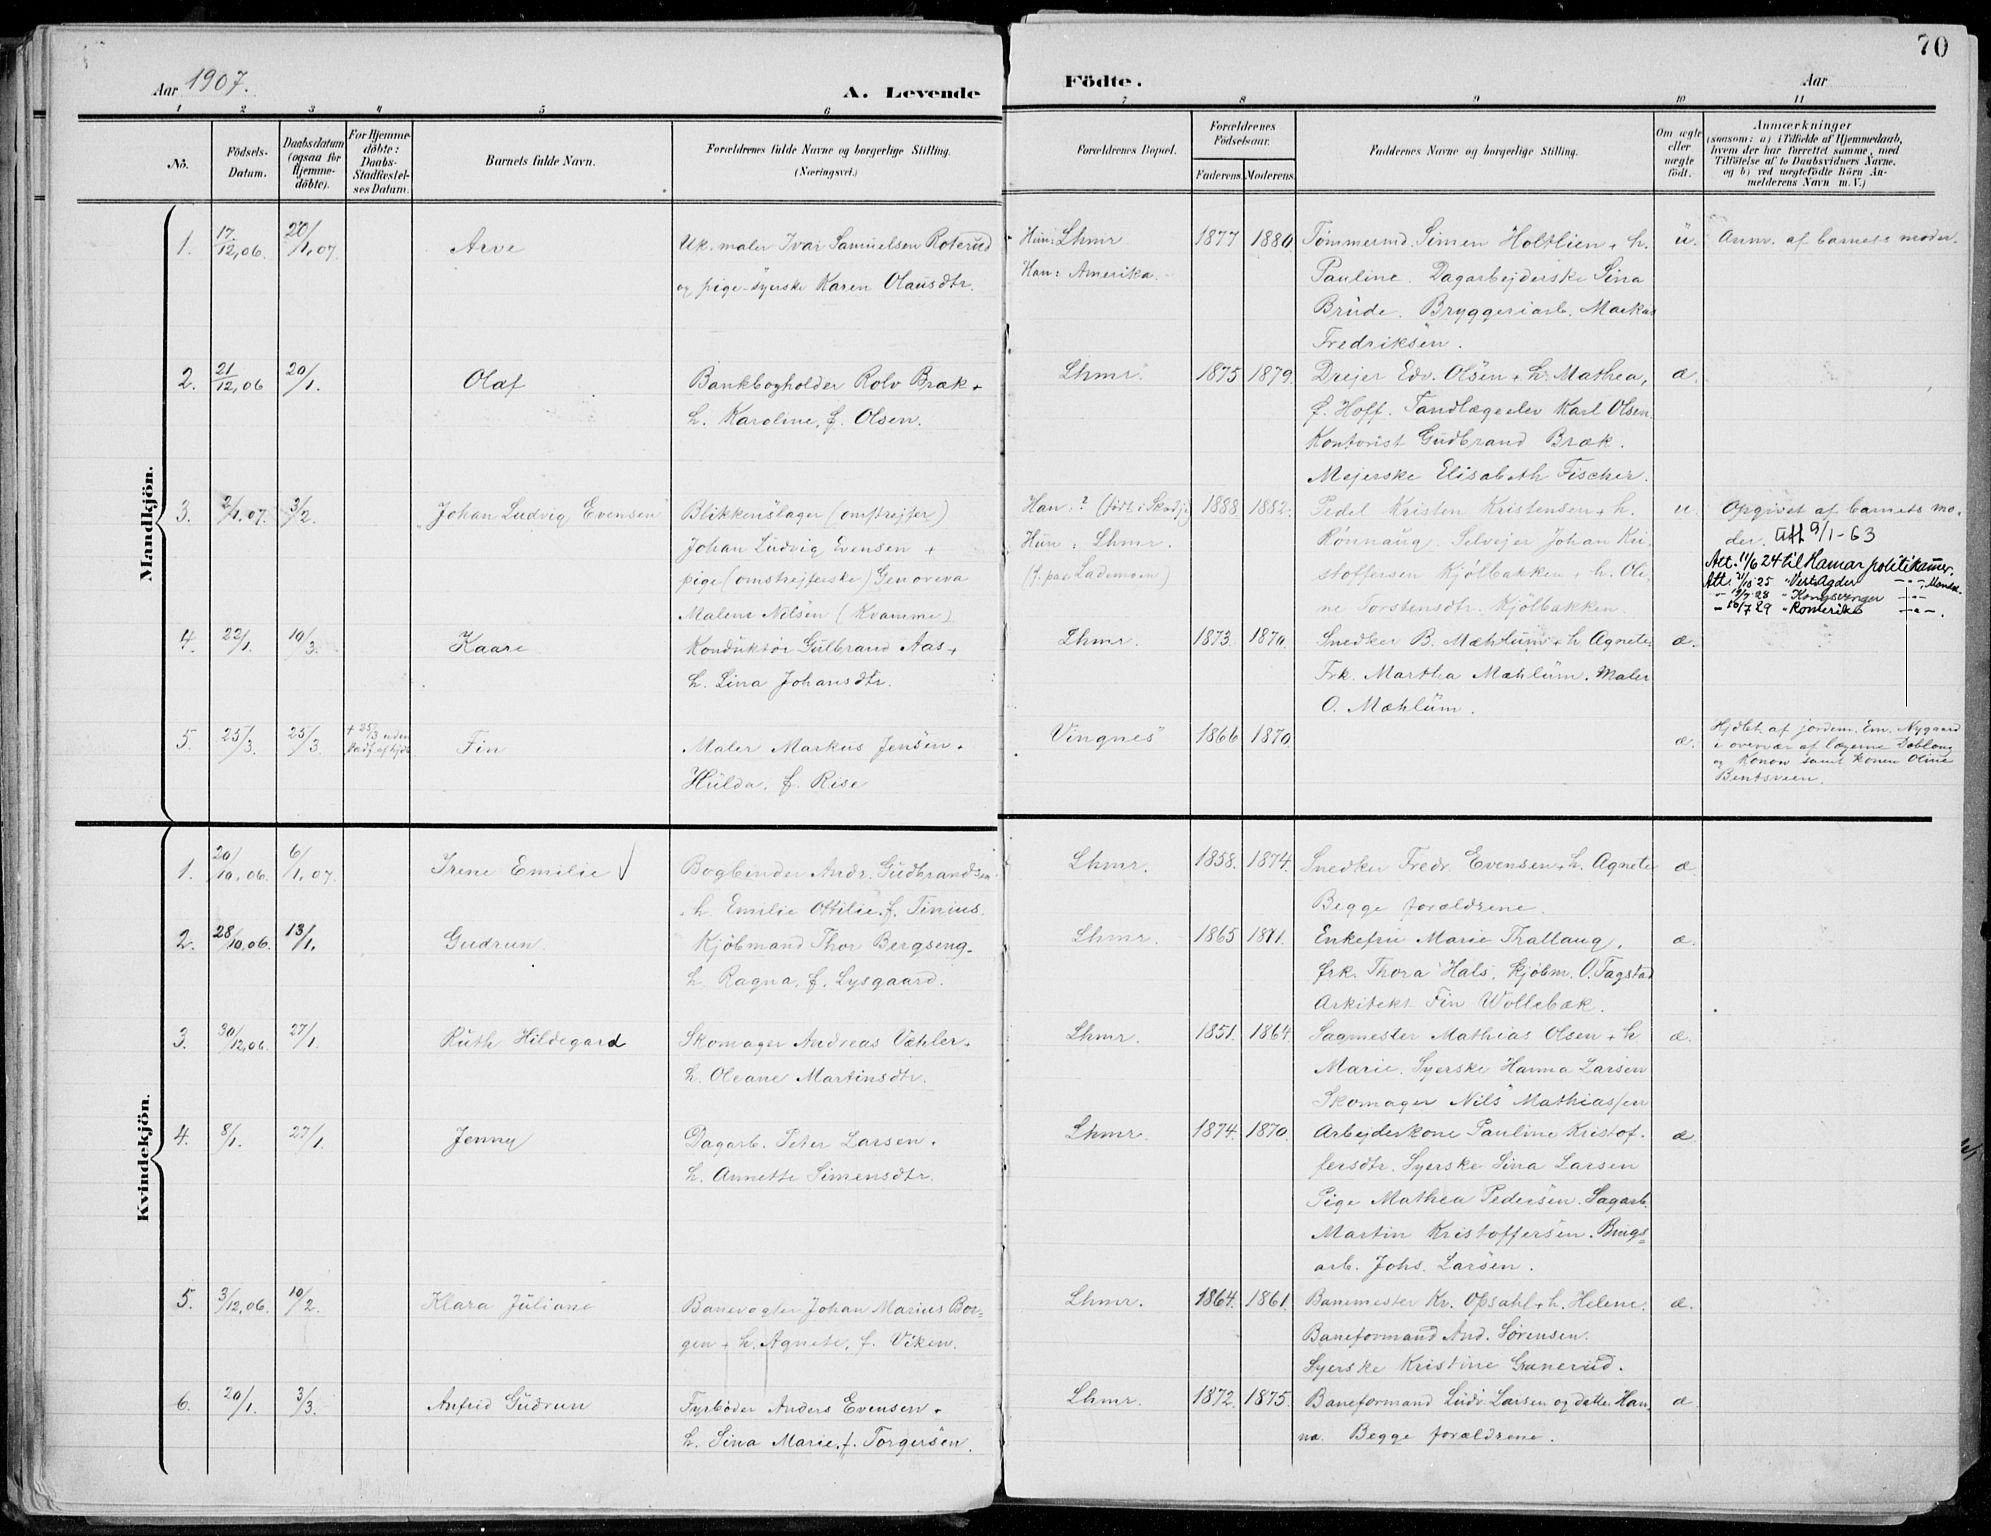 SAH, Lillehammer prestekontor, Ministerialbok nr. 1, 1901-1916, s. 70